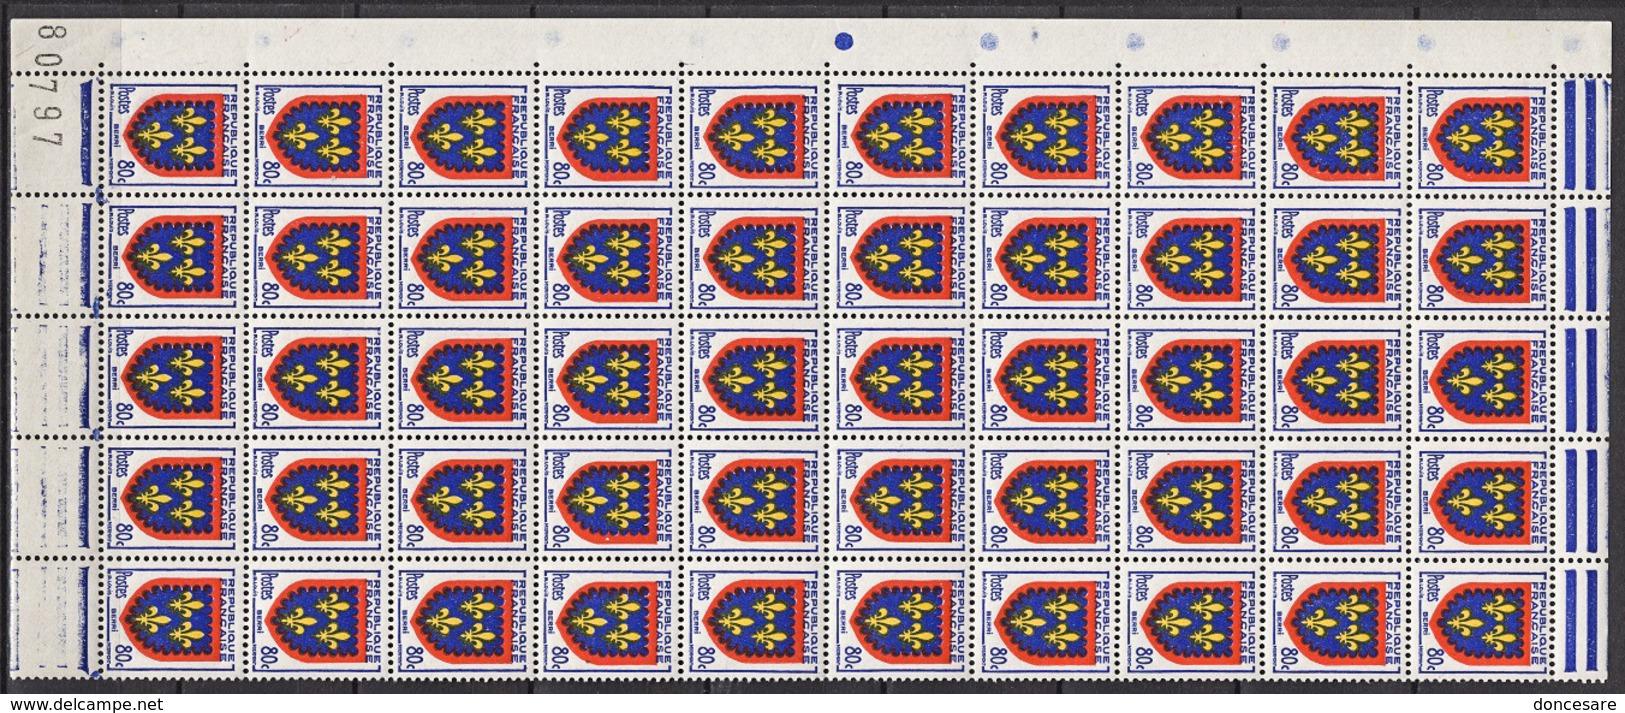 FRANCE 1953 - BLOC DE 50 Y.T. N° 959  - NEUFS** 66 - Ongebruikt